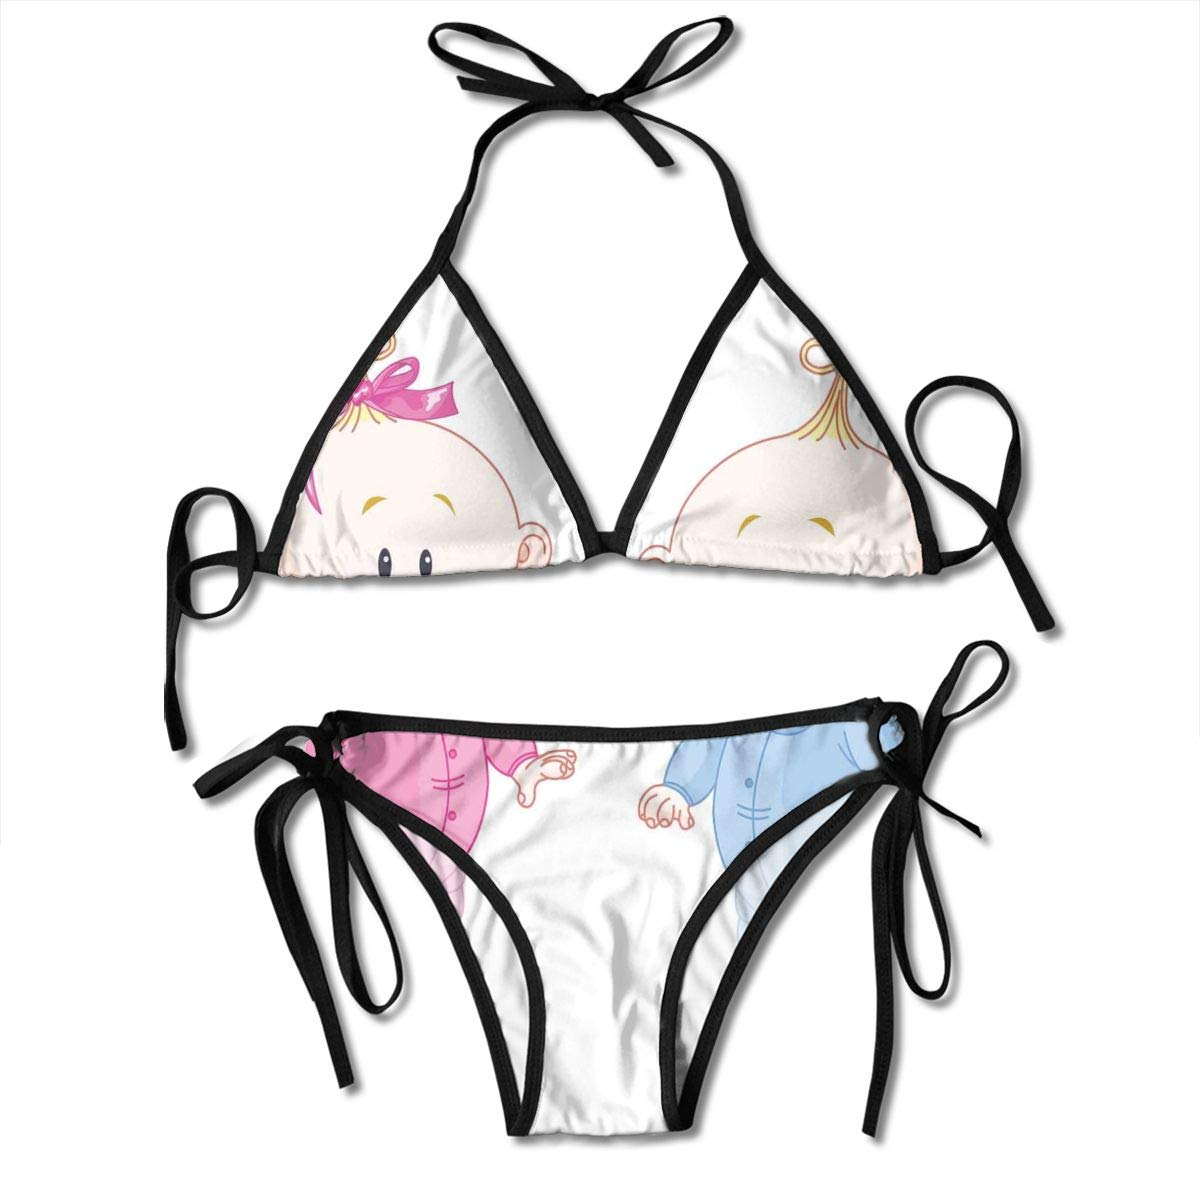 TYANG Womens Tie Side Bottom Padding Triangle Bikini Swimsuits,Cheerful Boy and Girl Children with Bunny Pacifiers Twins,Bikini Sets Beach Swimwear Bathing Suit